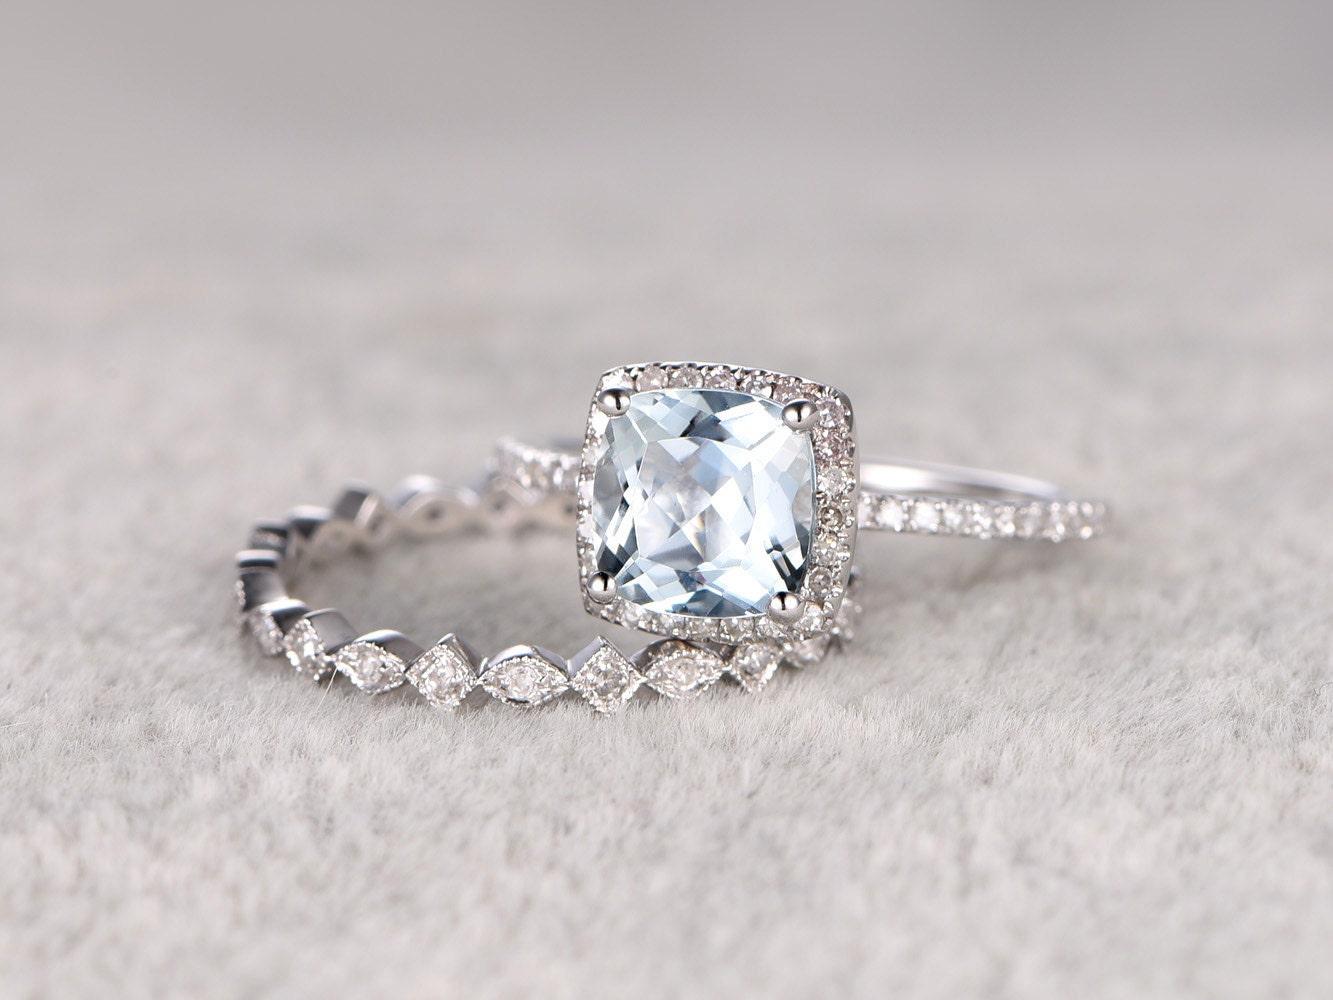 2pcs blue aquamarine wedding ring set engagement ringdiamond. Black Bedroom Furniture Sets. Home Design Ideas